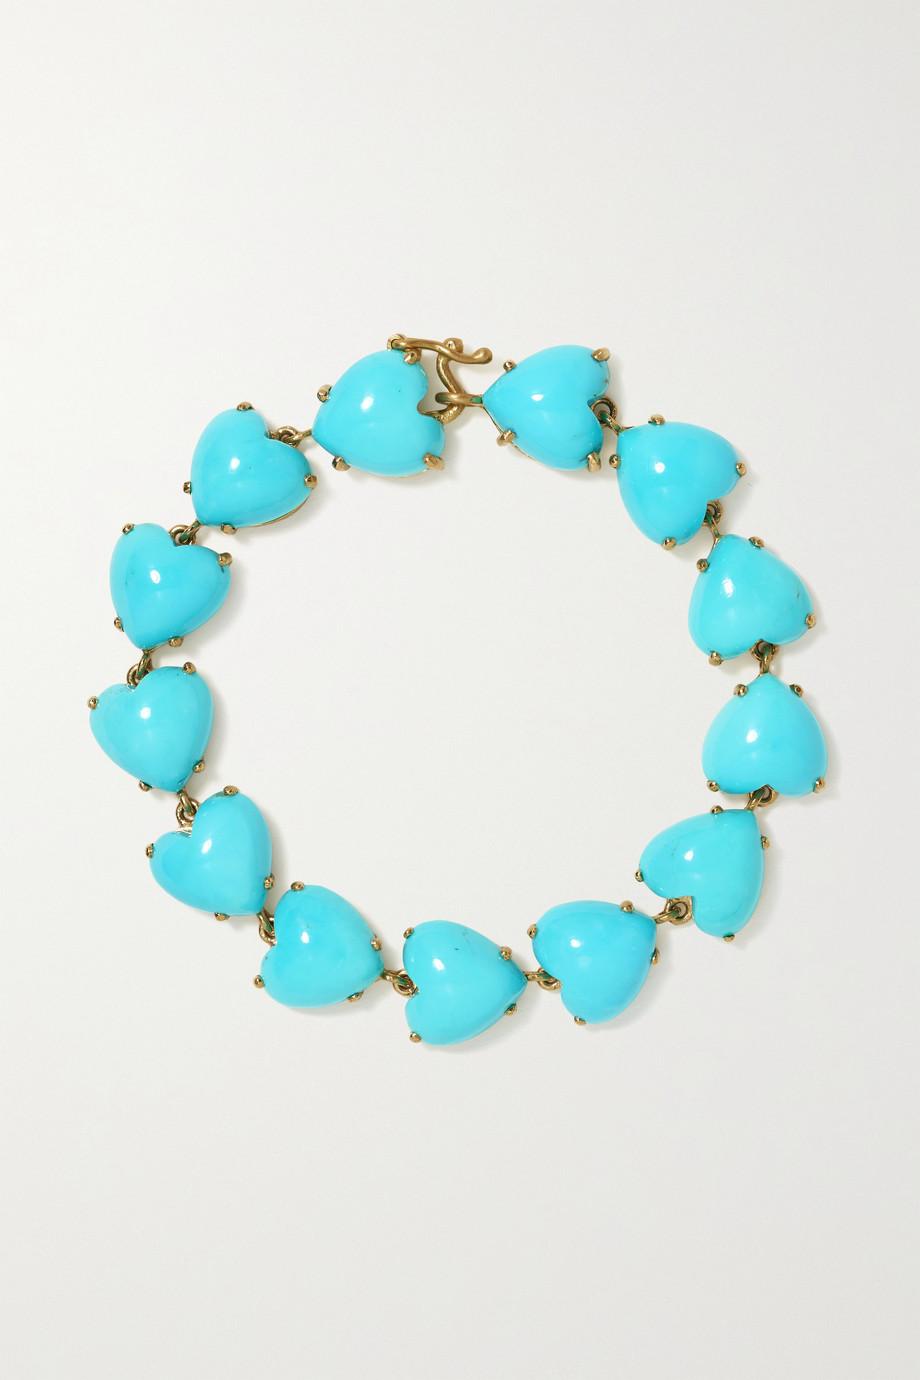 Irene Neuwirth Love 18-karat gold turquoise bracelet